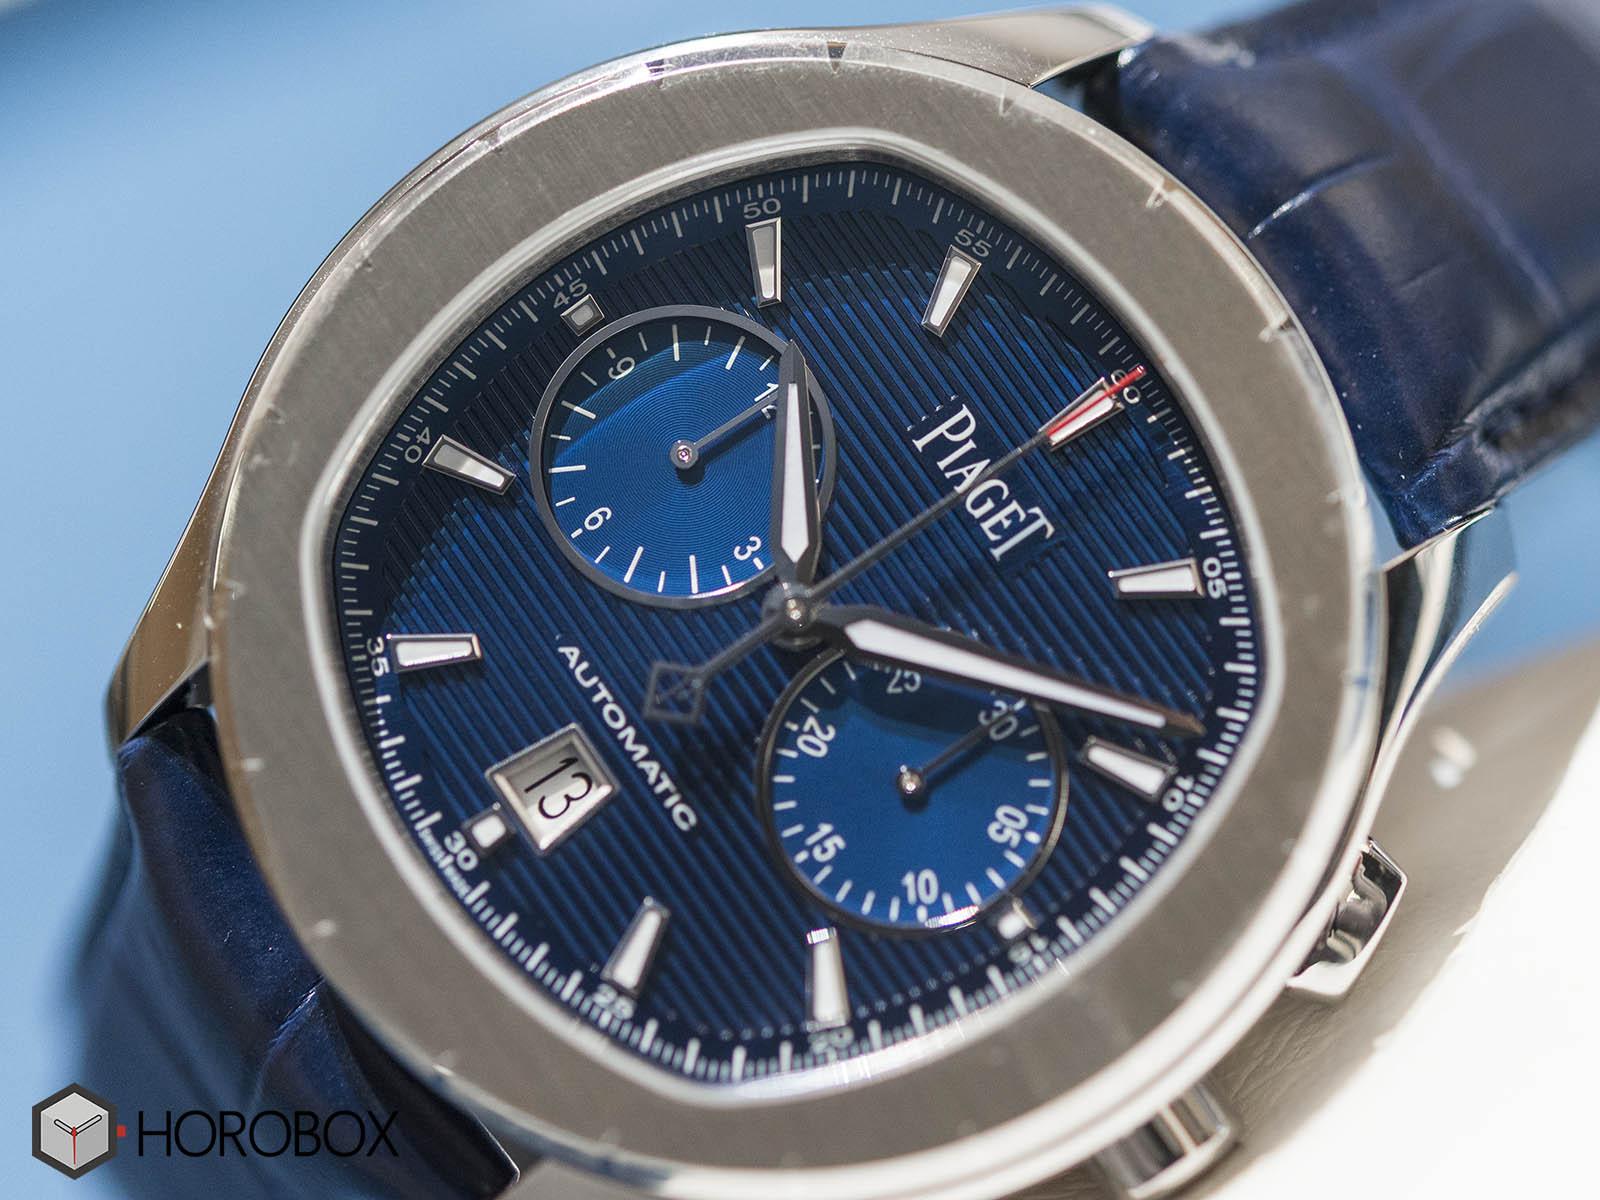 piaget-polo-s-chronograph-sihh-2018-2.jpg